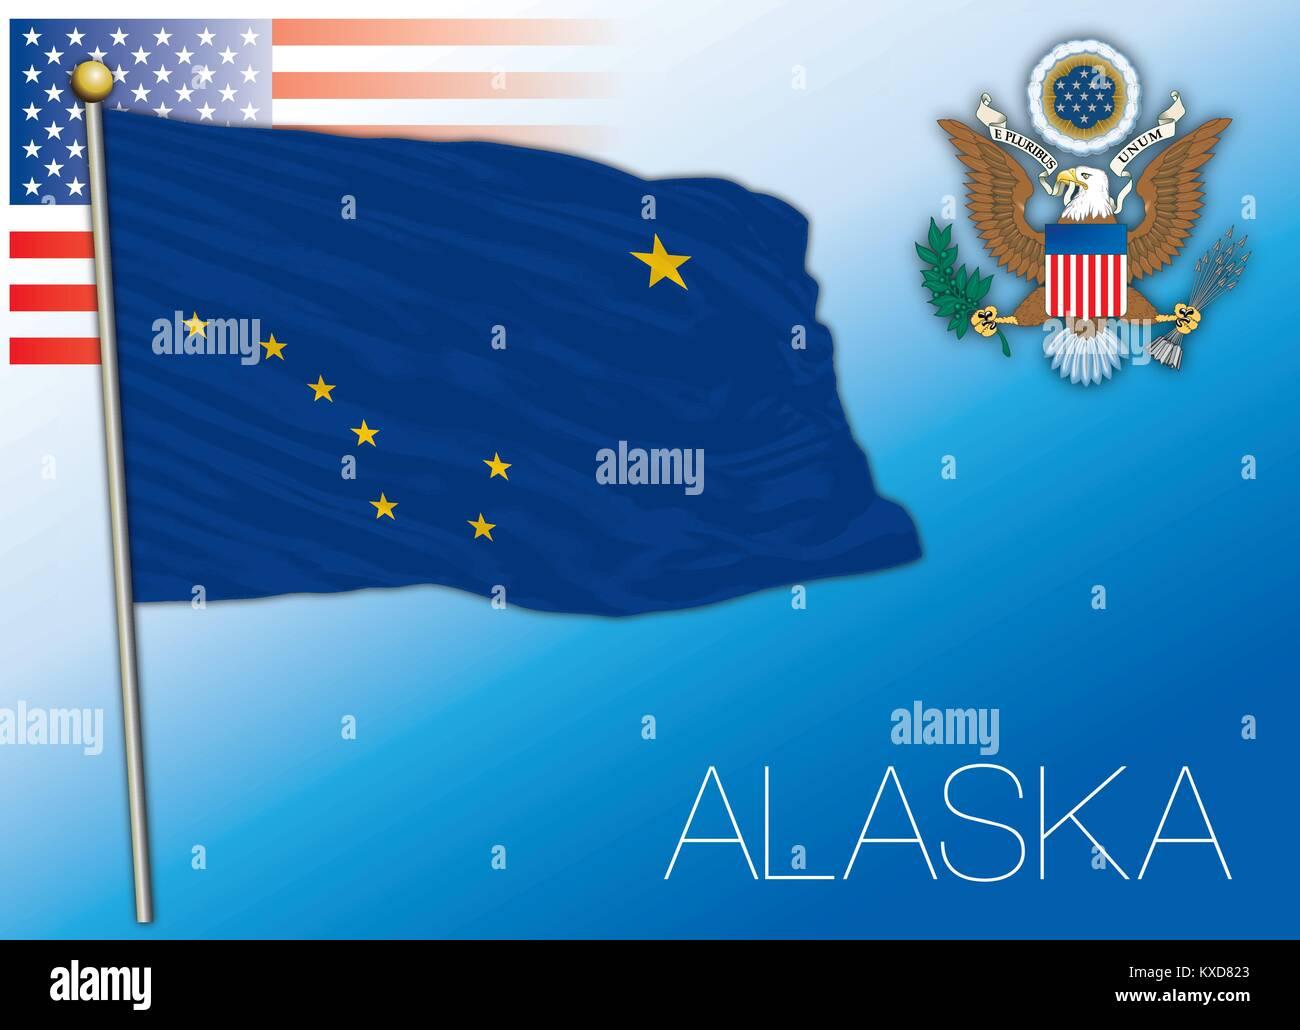 Alaska federal state flag, United States - Stock Vector